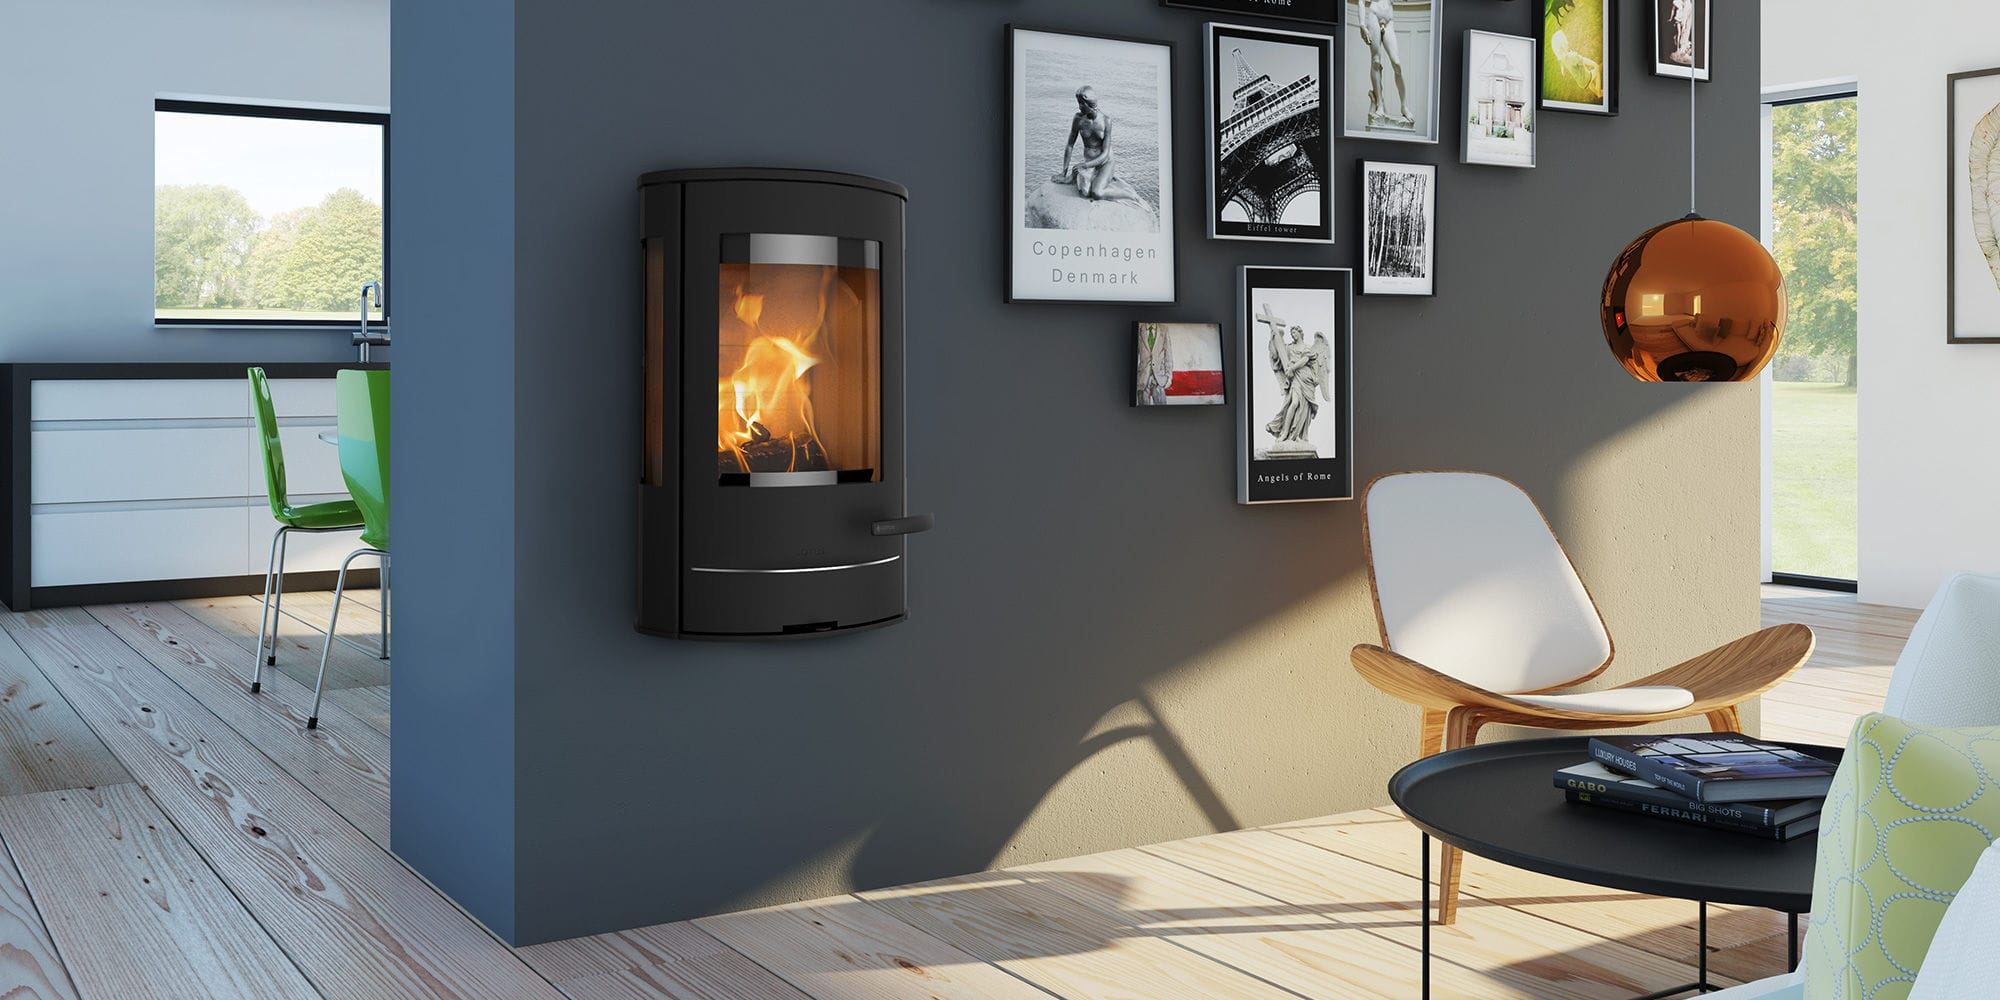 profitez du design du po le bois suspendu scandinave. Black Bedroom Furniture Sets. Home Design Ideas